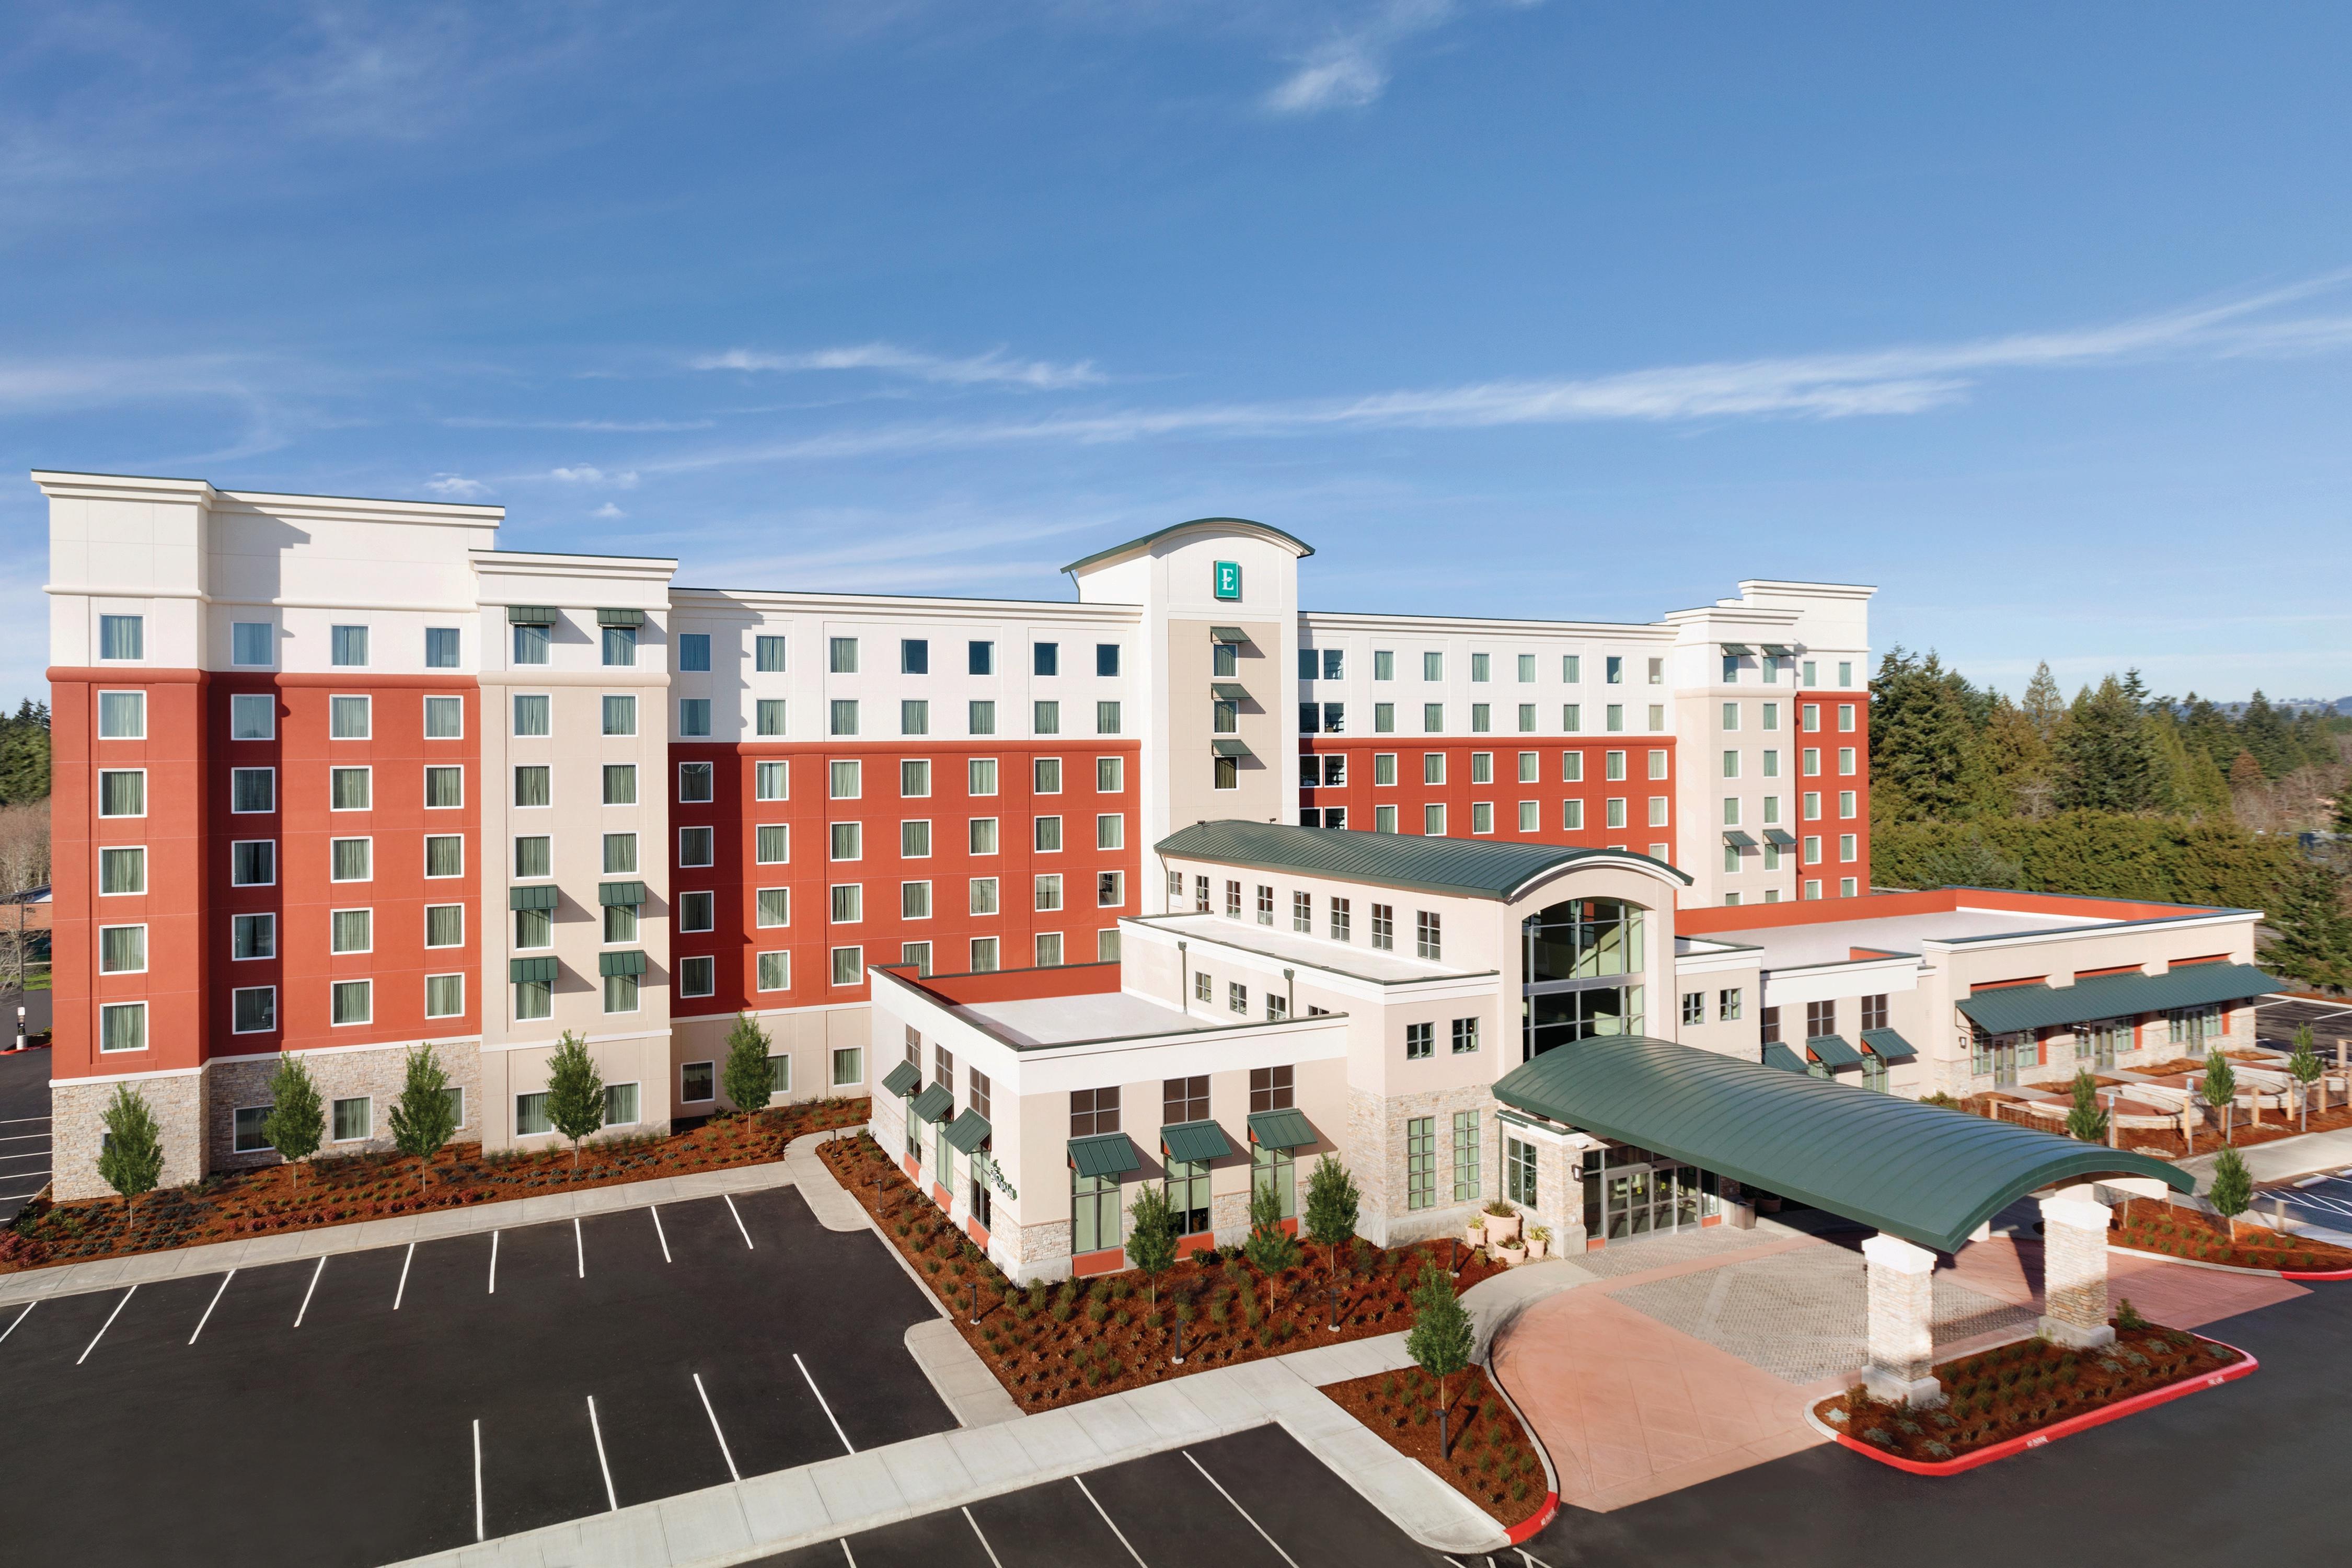 Embassy Suites by Hilton Portland Hillsboro, Oregon image 0